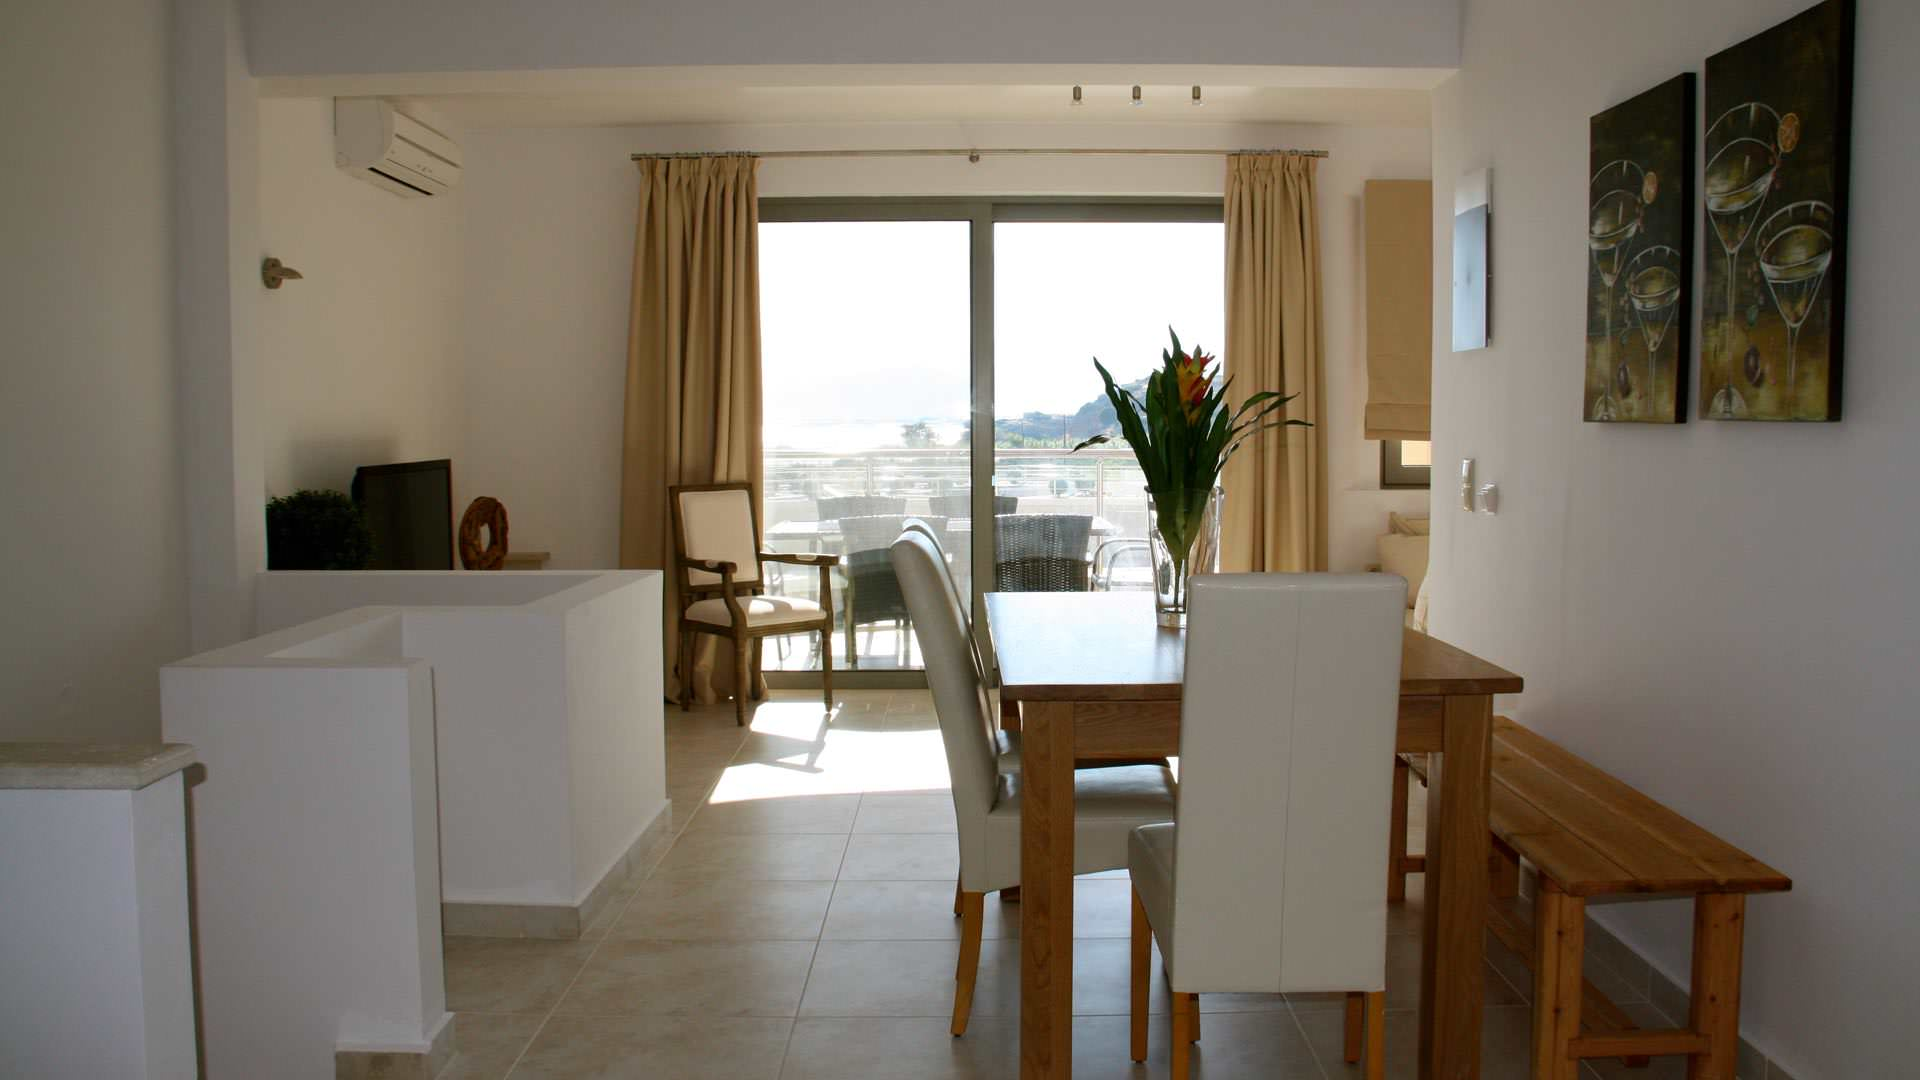 townhouse-maisonette-living-luxurious-bayview-resort